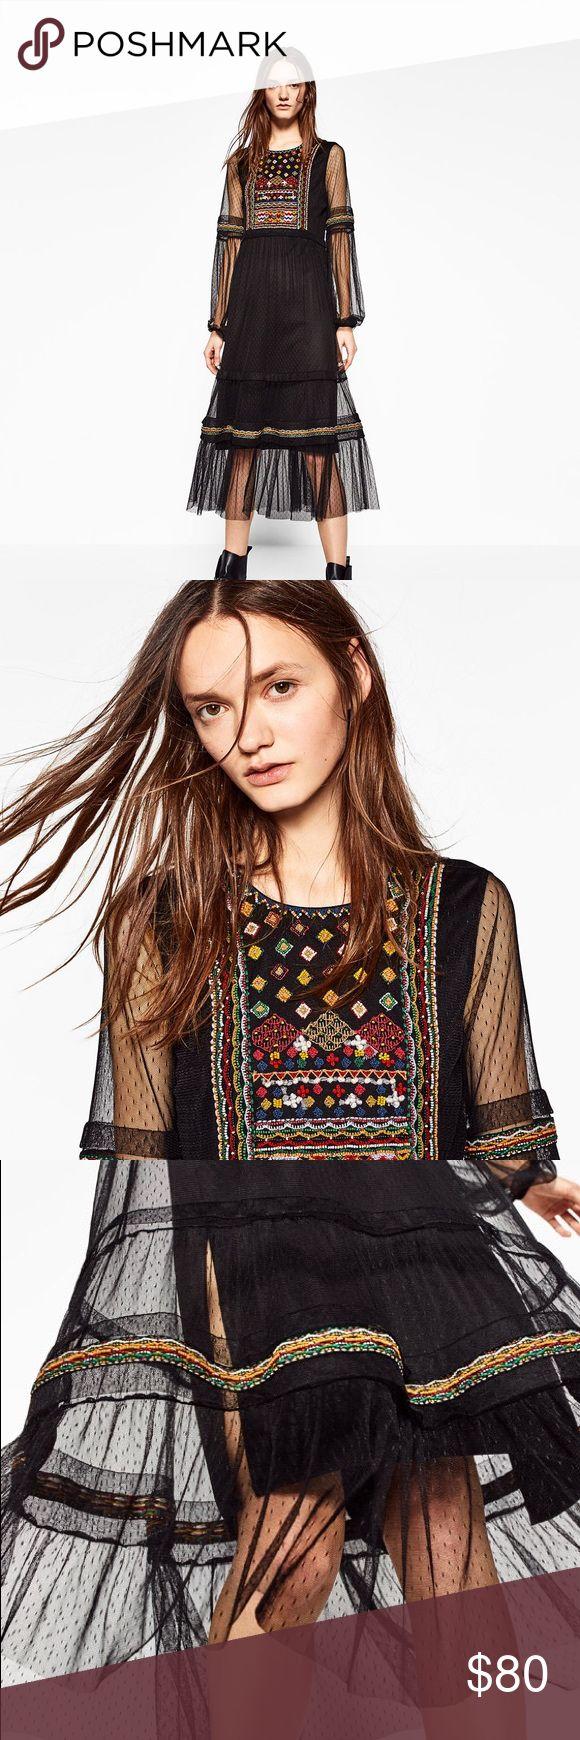 Zara Plumetis embroidered dress Beautiful dress sold out everywhere Zara Dresses Midi